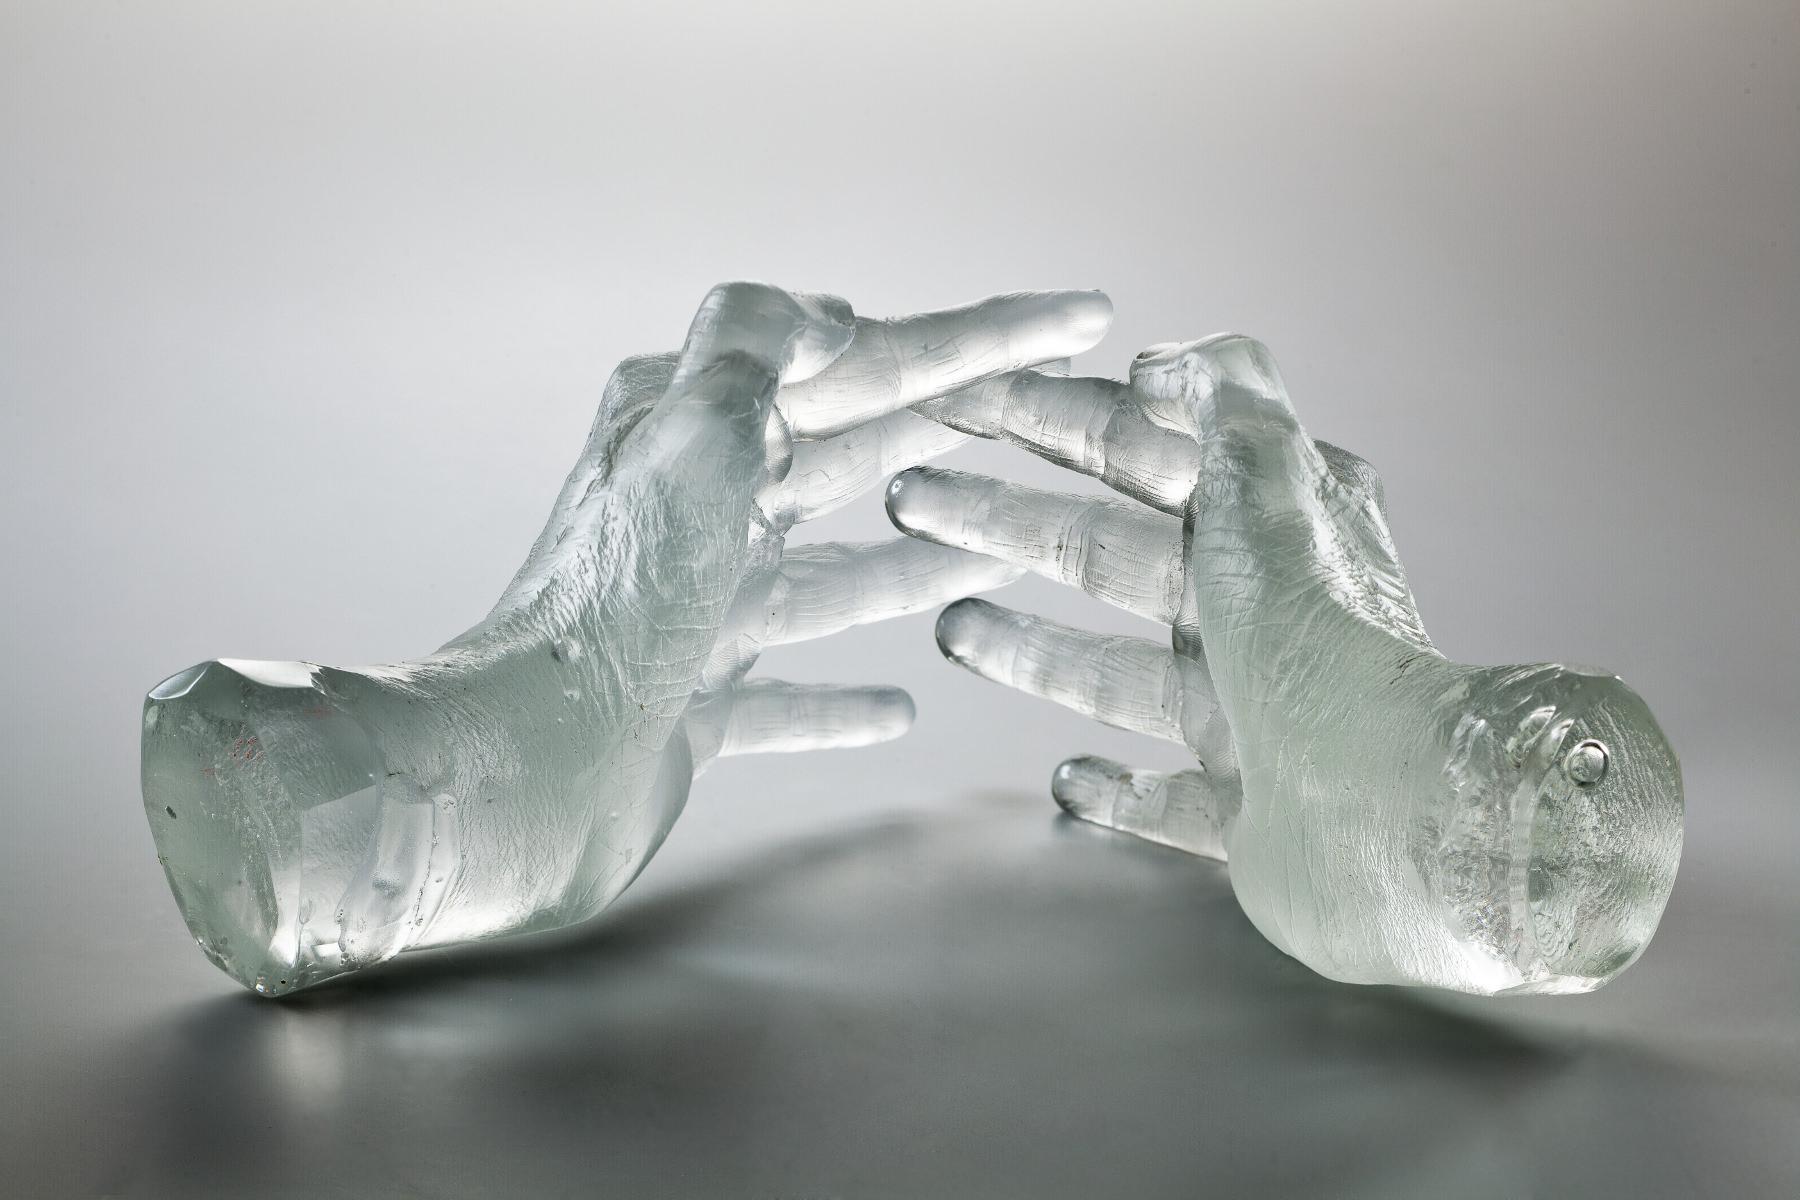 Jaume Plensa - Laura's Hands